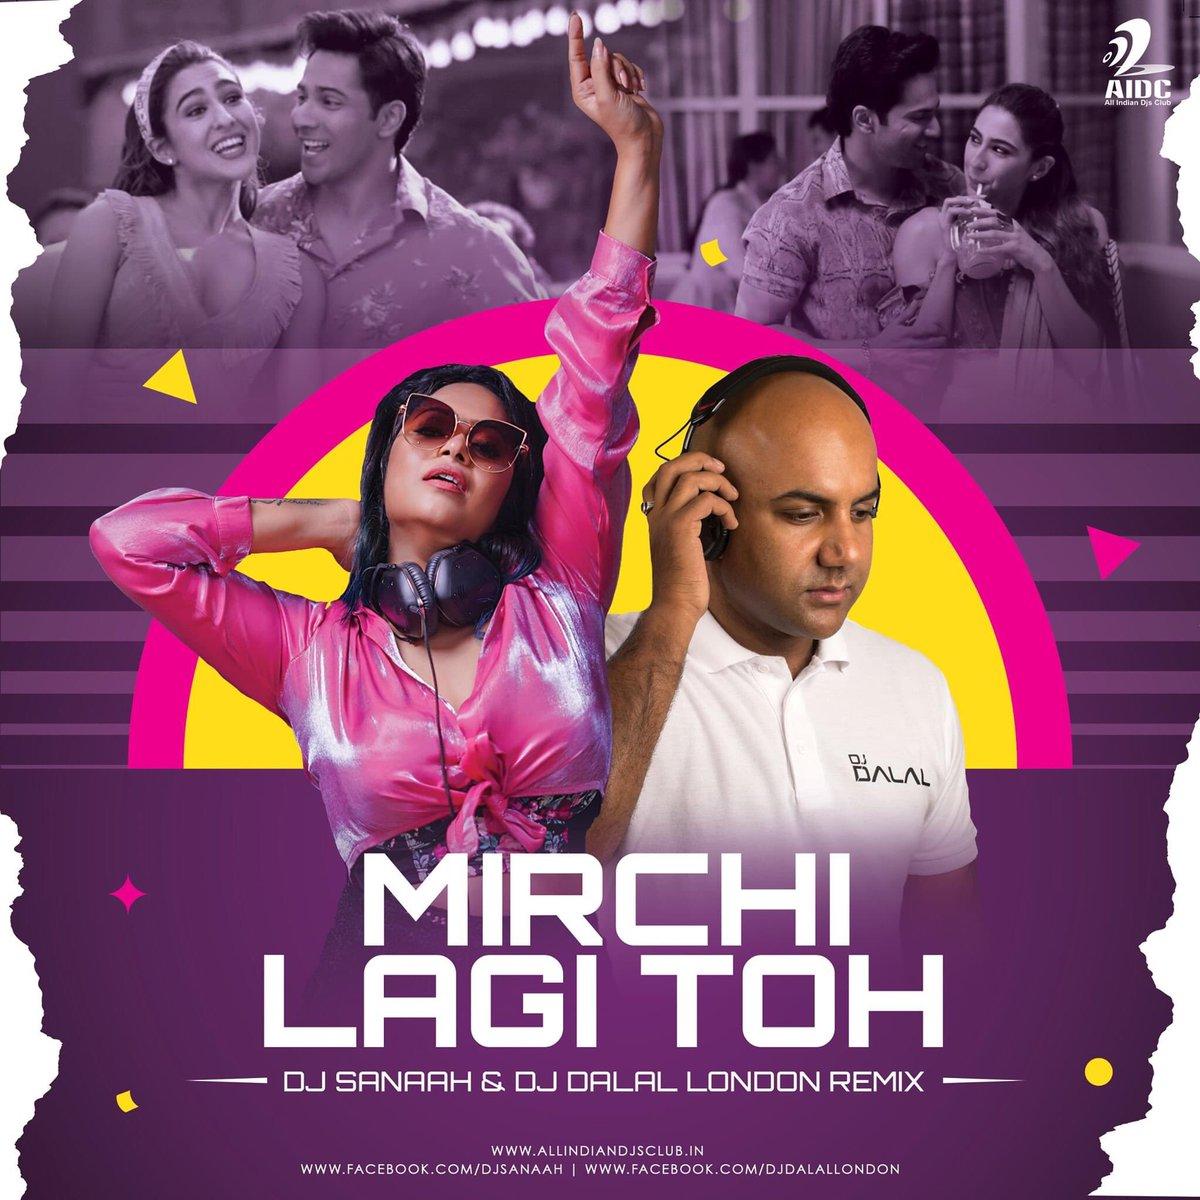 Mirchi Lagi Toh (Remix) - Sanaah X DJ DALAL LONDON  Download Mp3:   #mirchilagitoh #remix #sanaah #djdalallondon